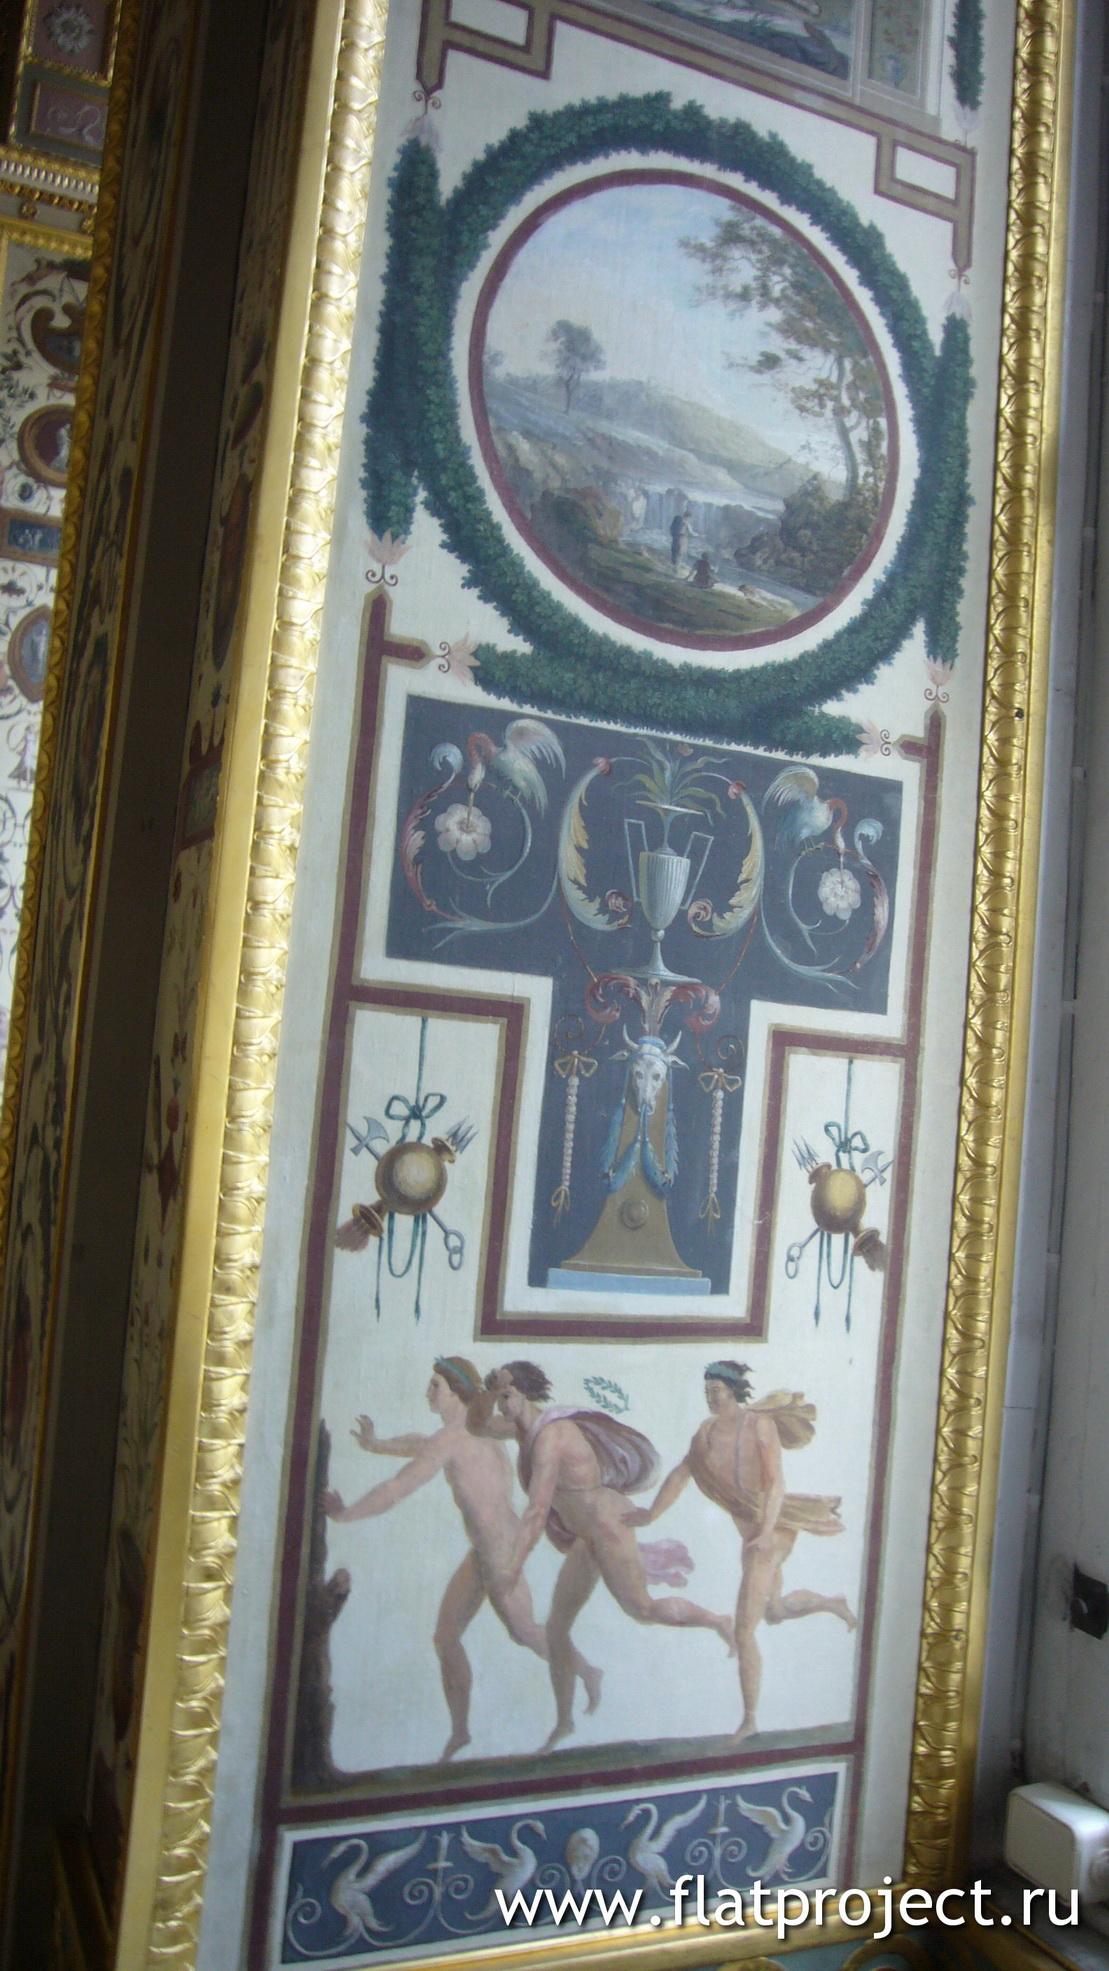 The State Hermitage museum interiors – photo 165